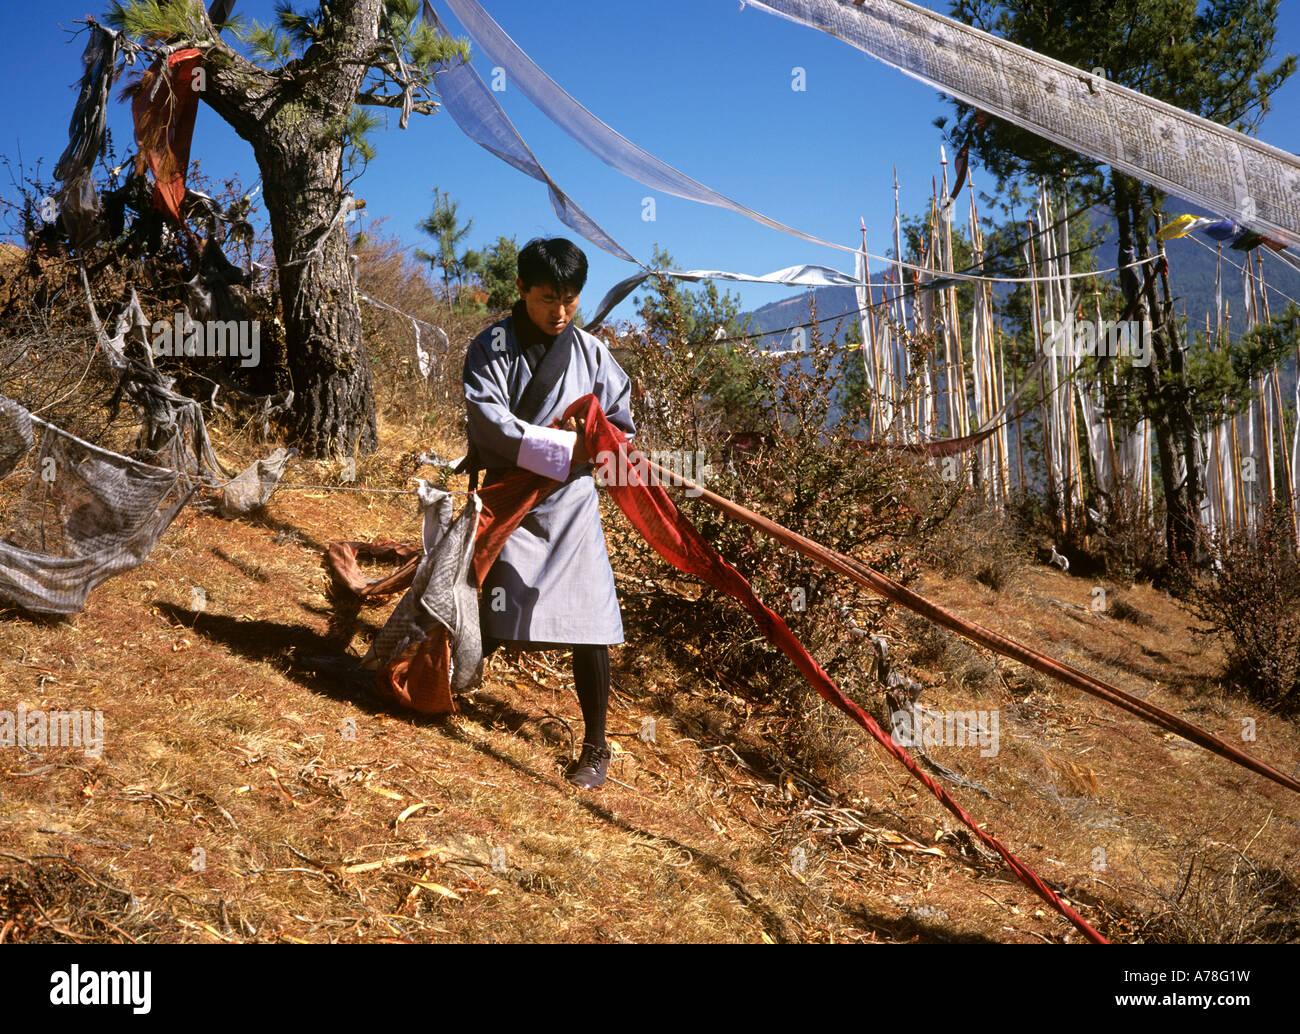 Bhutan Thimpu man tying up prayer flags at Motithang - Stock Image